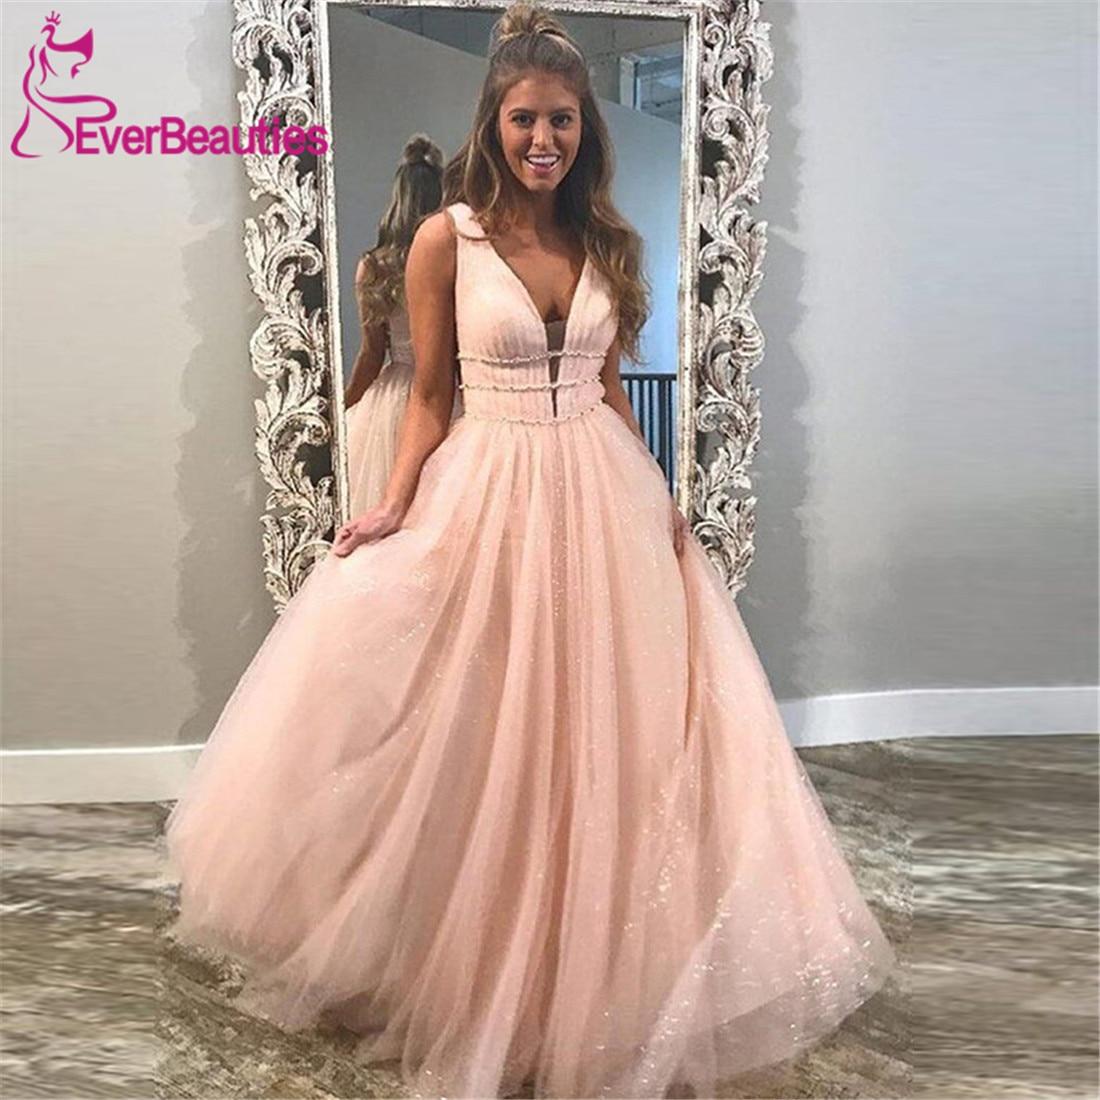 Sparkly A-Line Long Prom Dresses V Neck Formal Dresses Vestidos De Gala Prom Gown Robe De Soiree